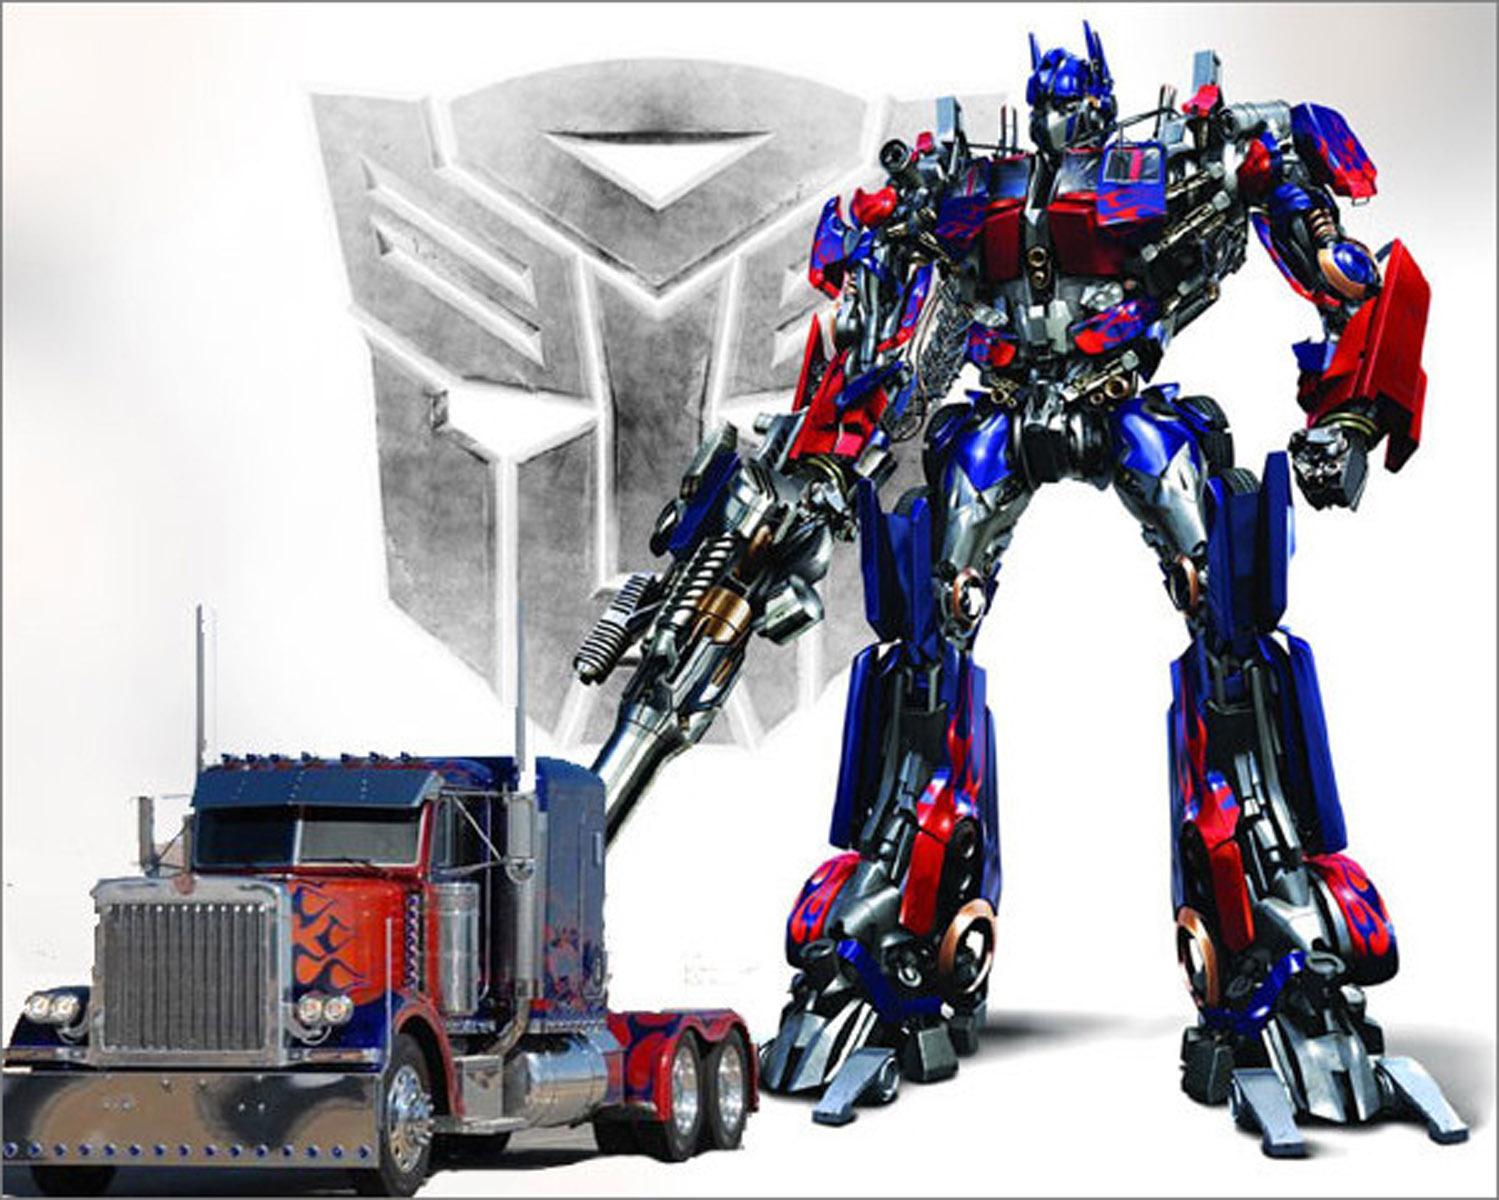 fi megaverse the mecha genre preview part 2 plus more transformers